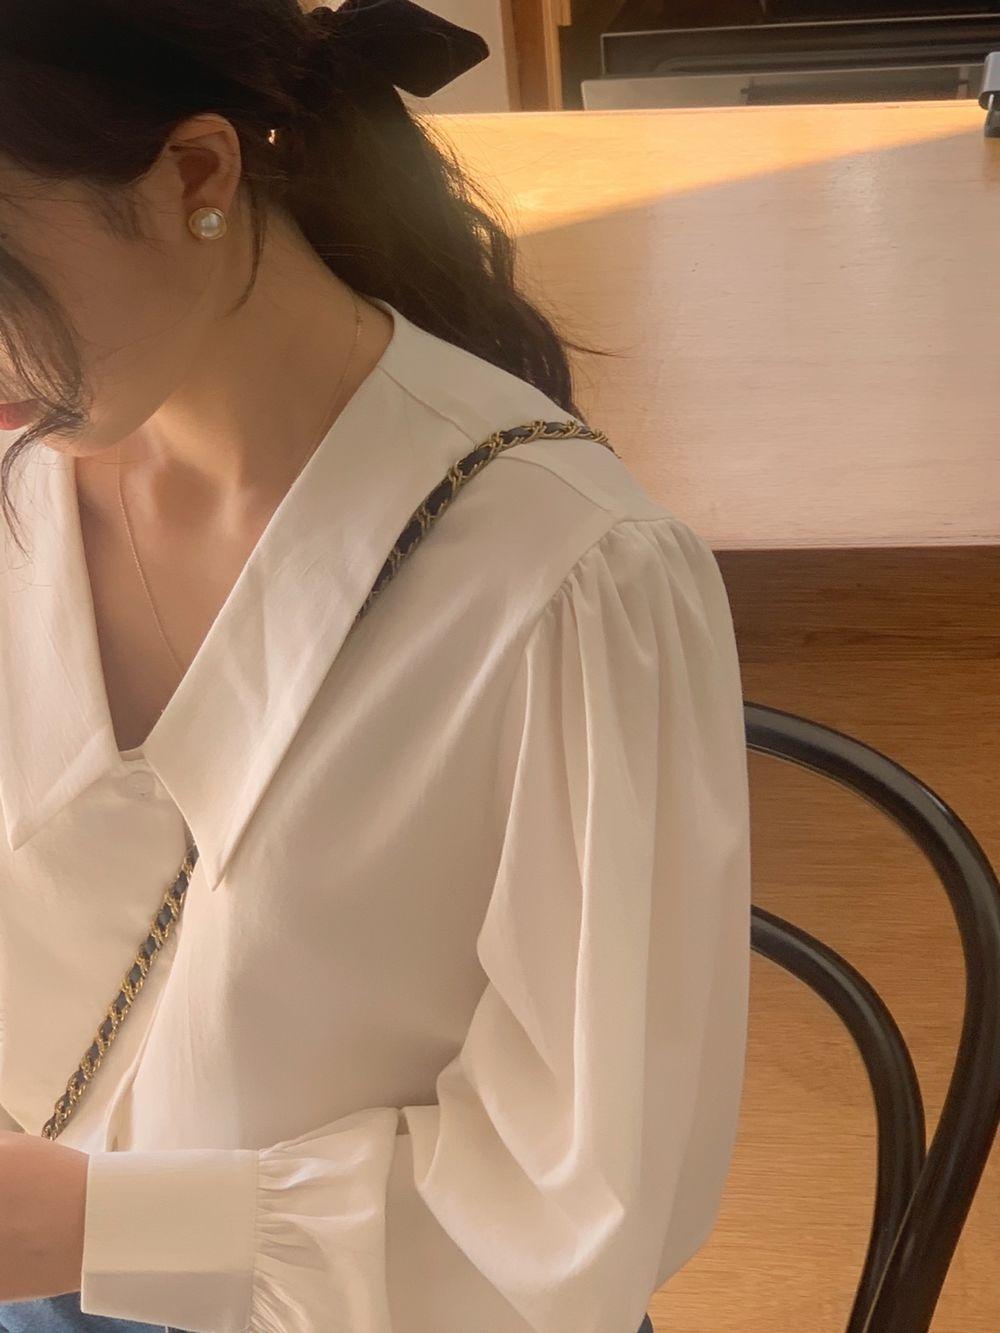 H624479e1e70841d2b5582fadbfd1a71ce - Spring / Autumn Chelsea Collar Long Sleeves Solid Blouse